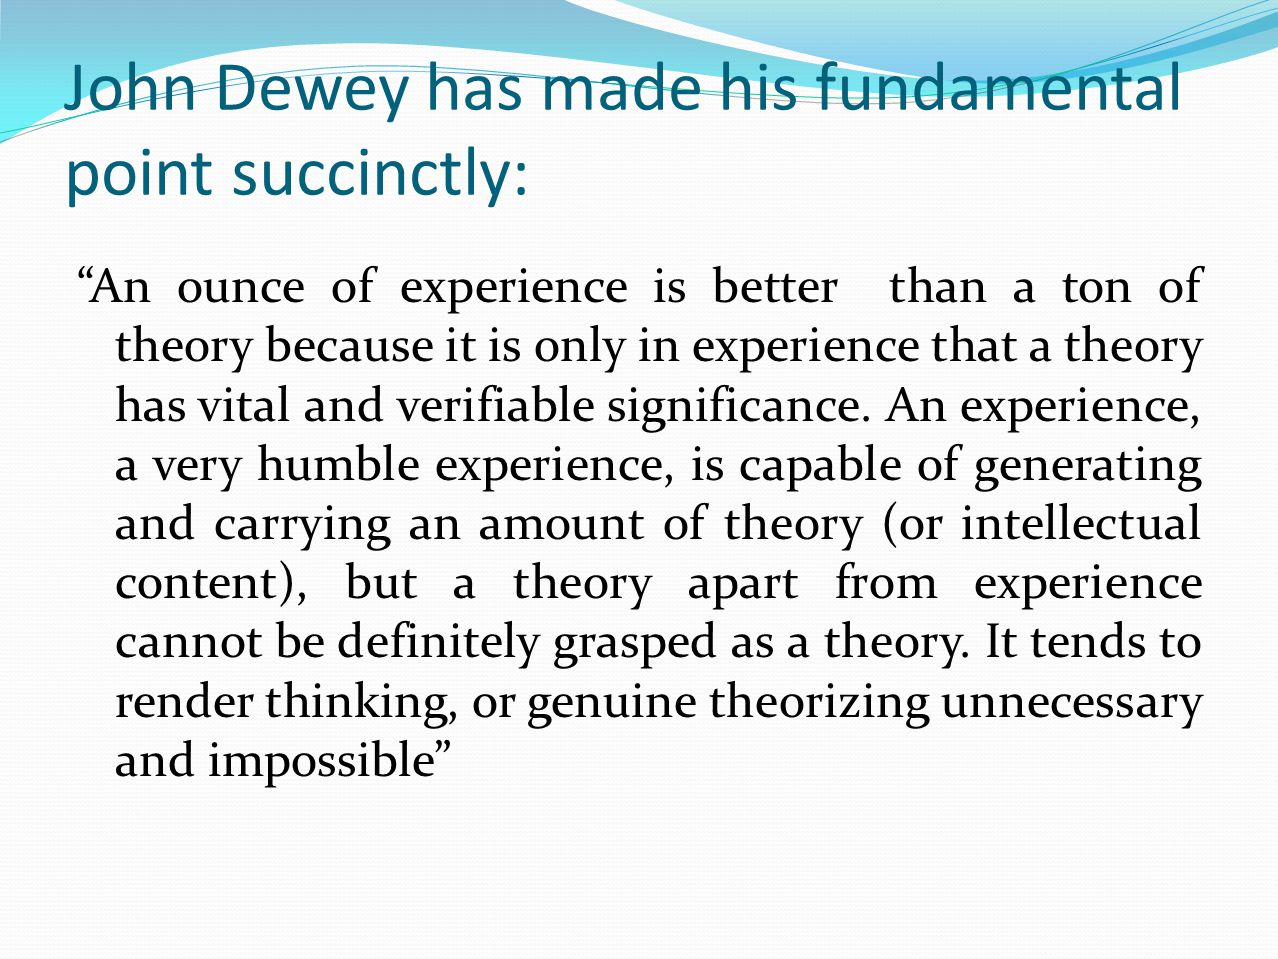 John Dewey has made his fundamental point succinctly: